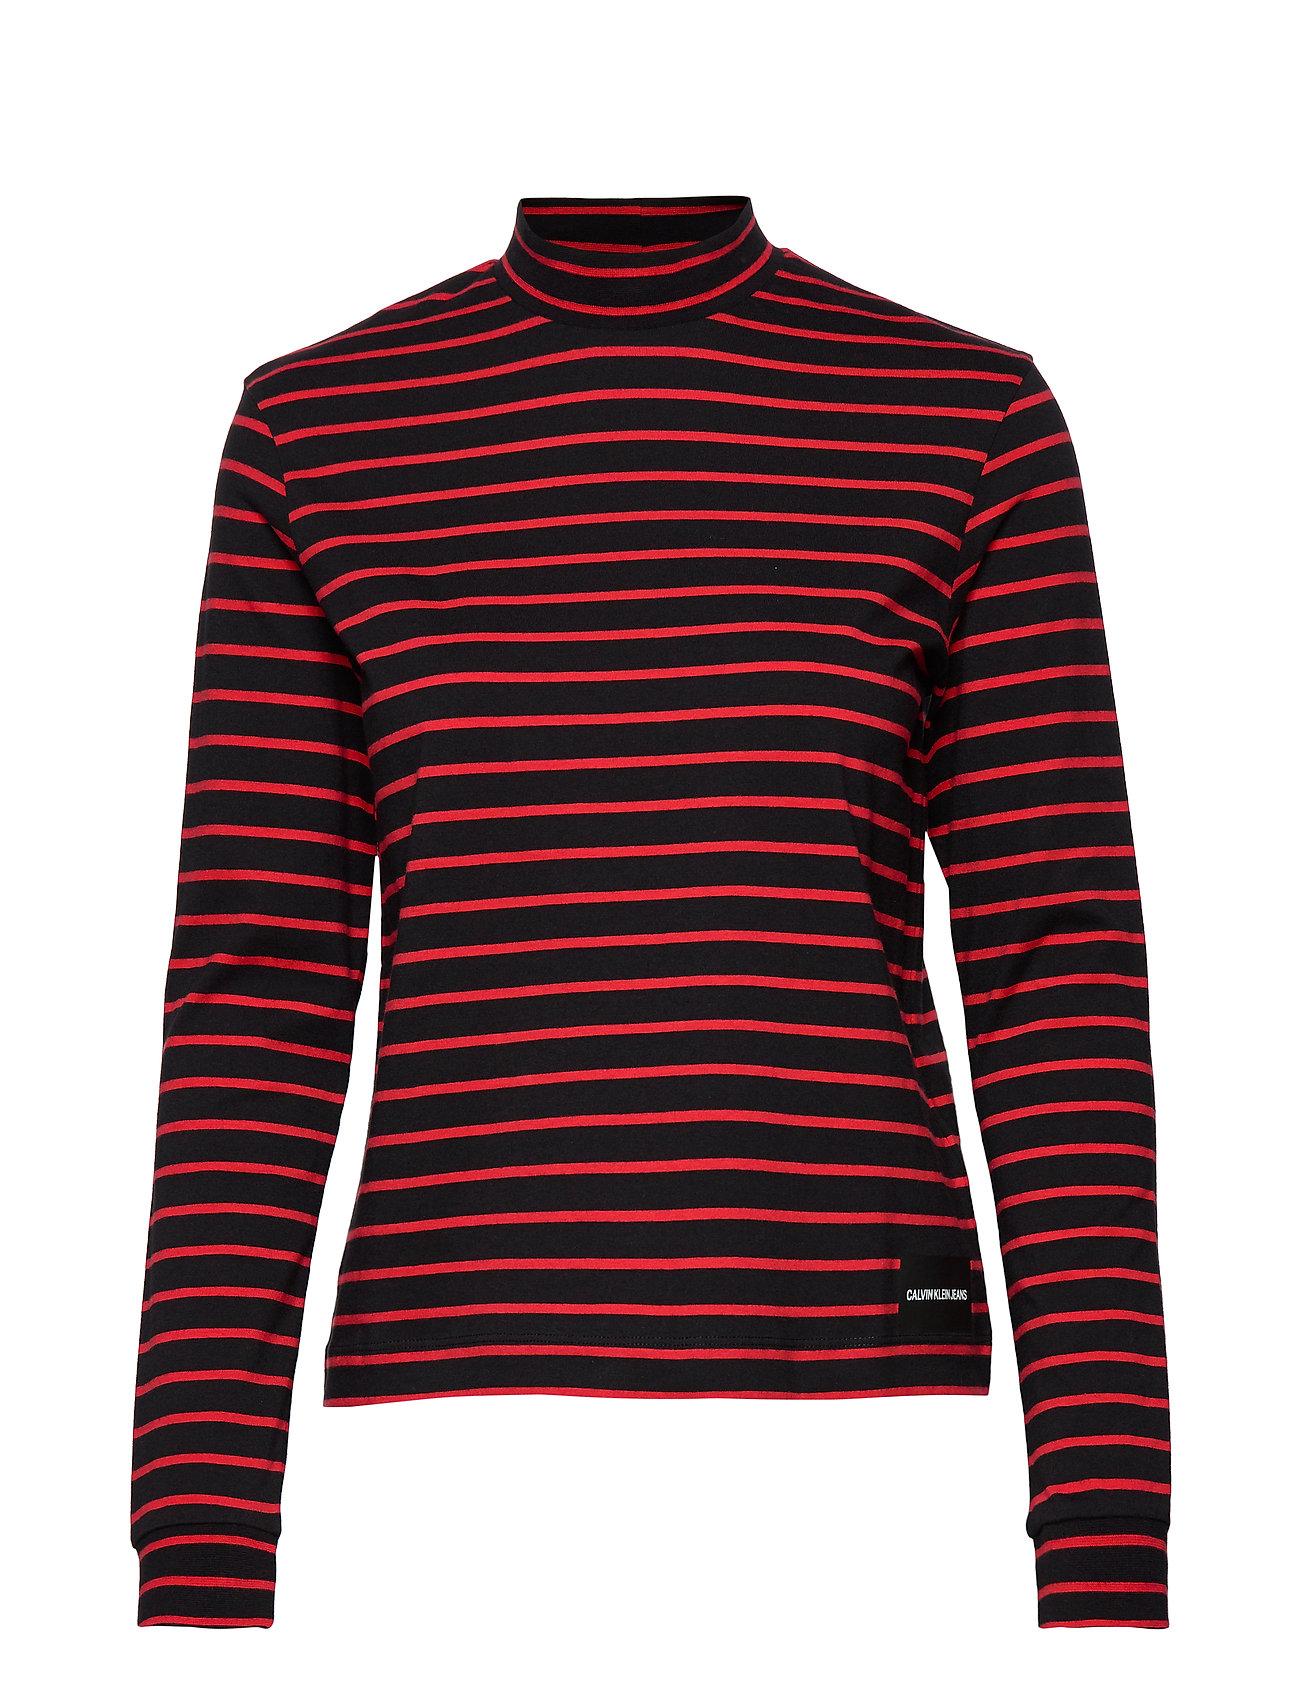 Calvin Klein Jeans MOCK NECK LS TEE - CK BLACK/ RED STRIPES